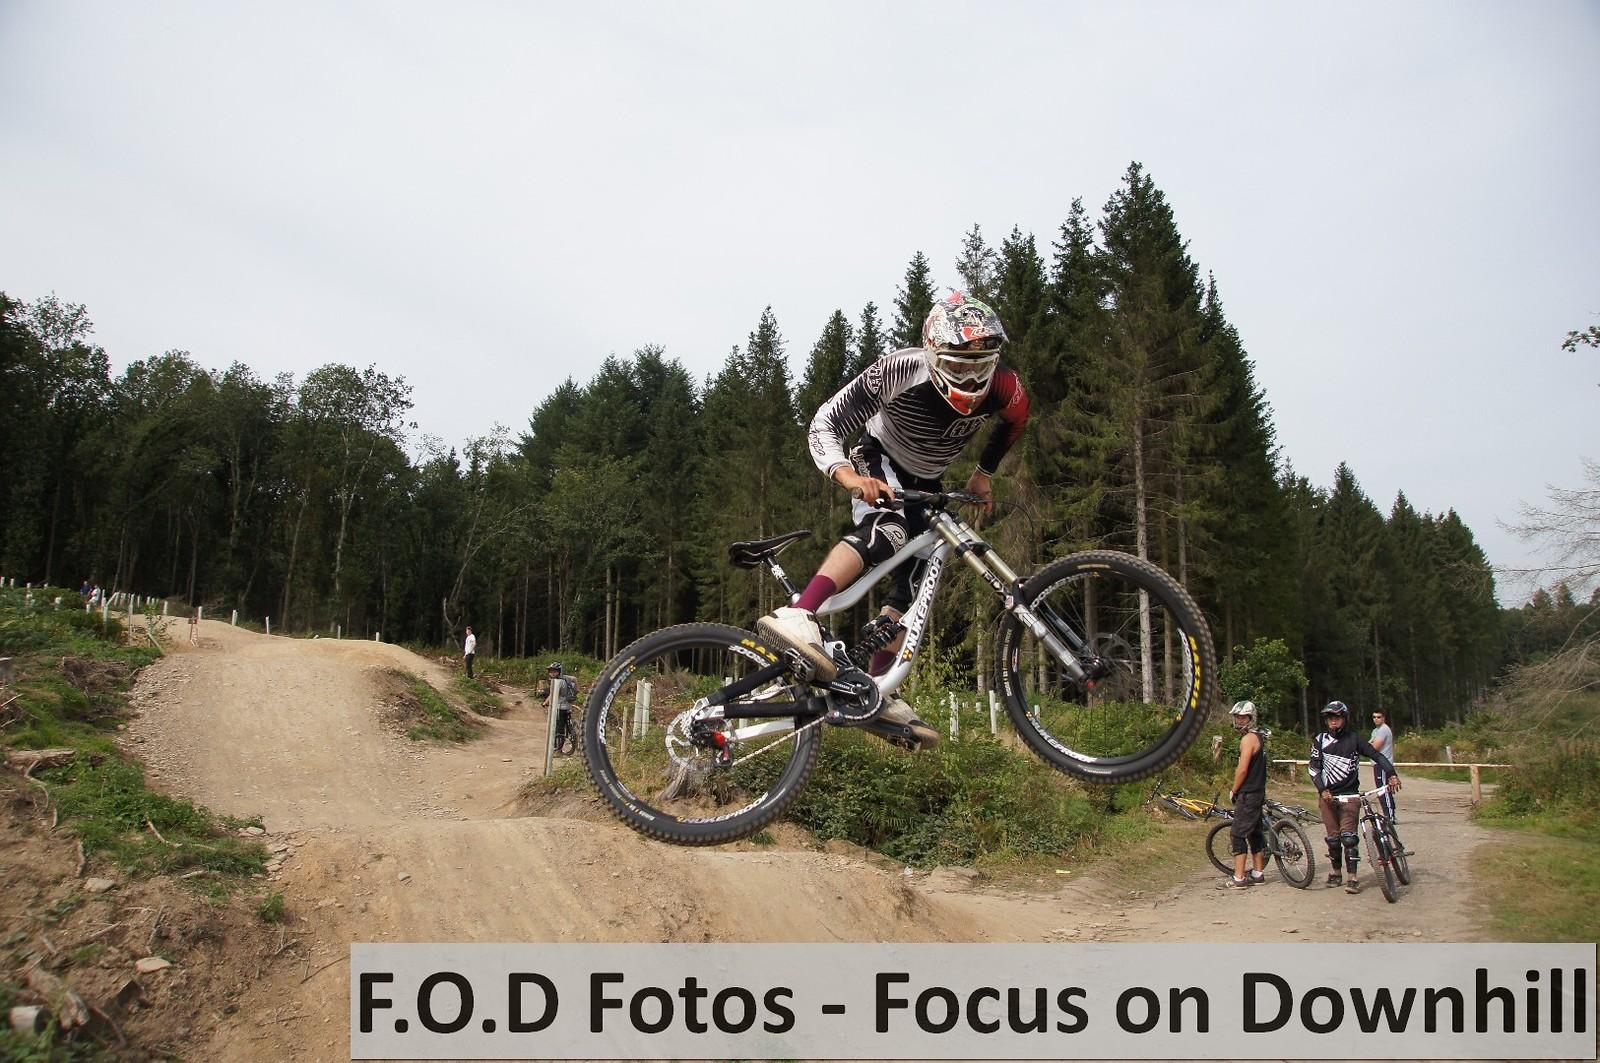 Dan DC Coulson Whip - Fodfotos - Mountain Biking Pictures - Vital MTB